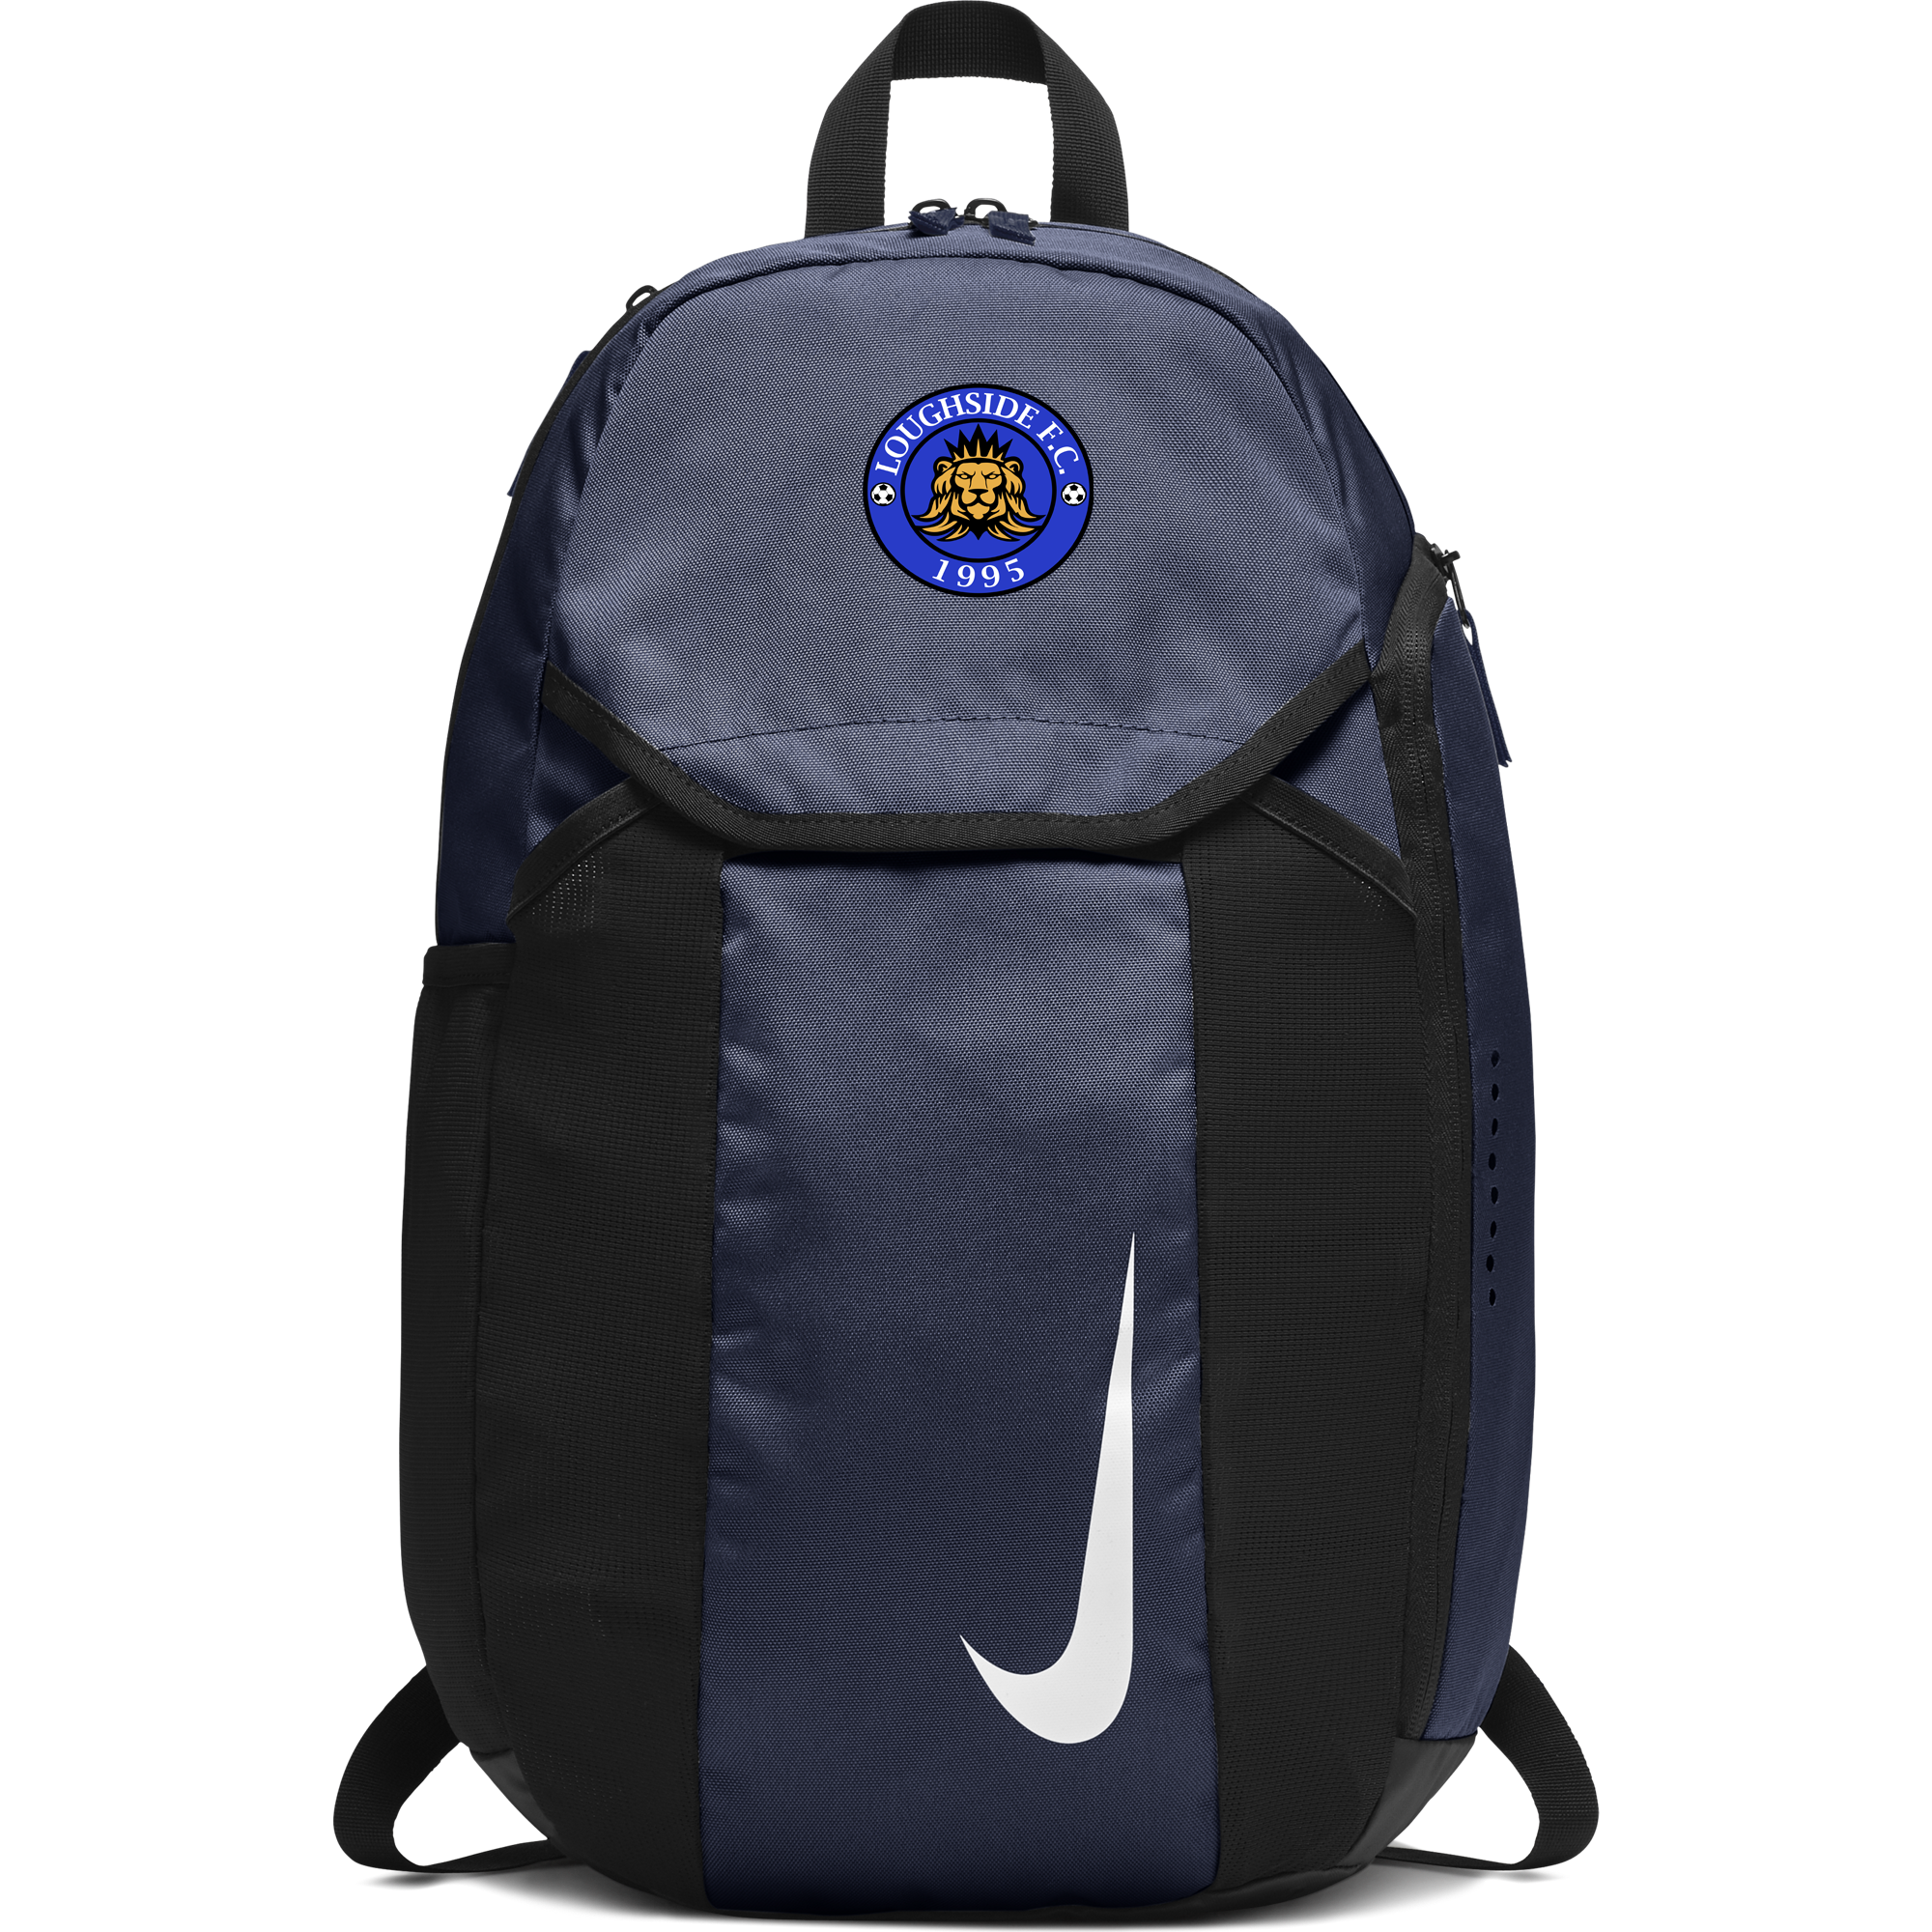 loughside backpack 36977 p